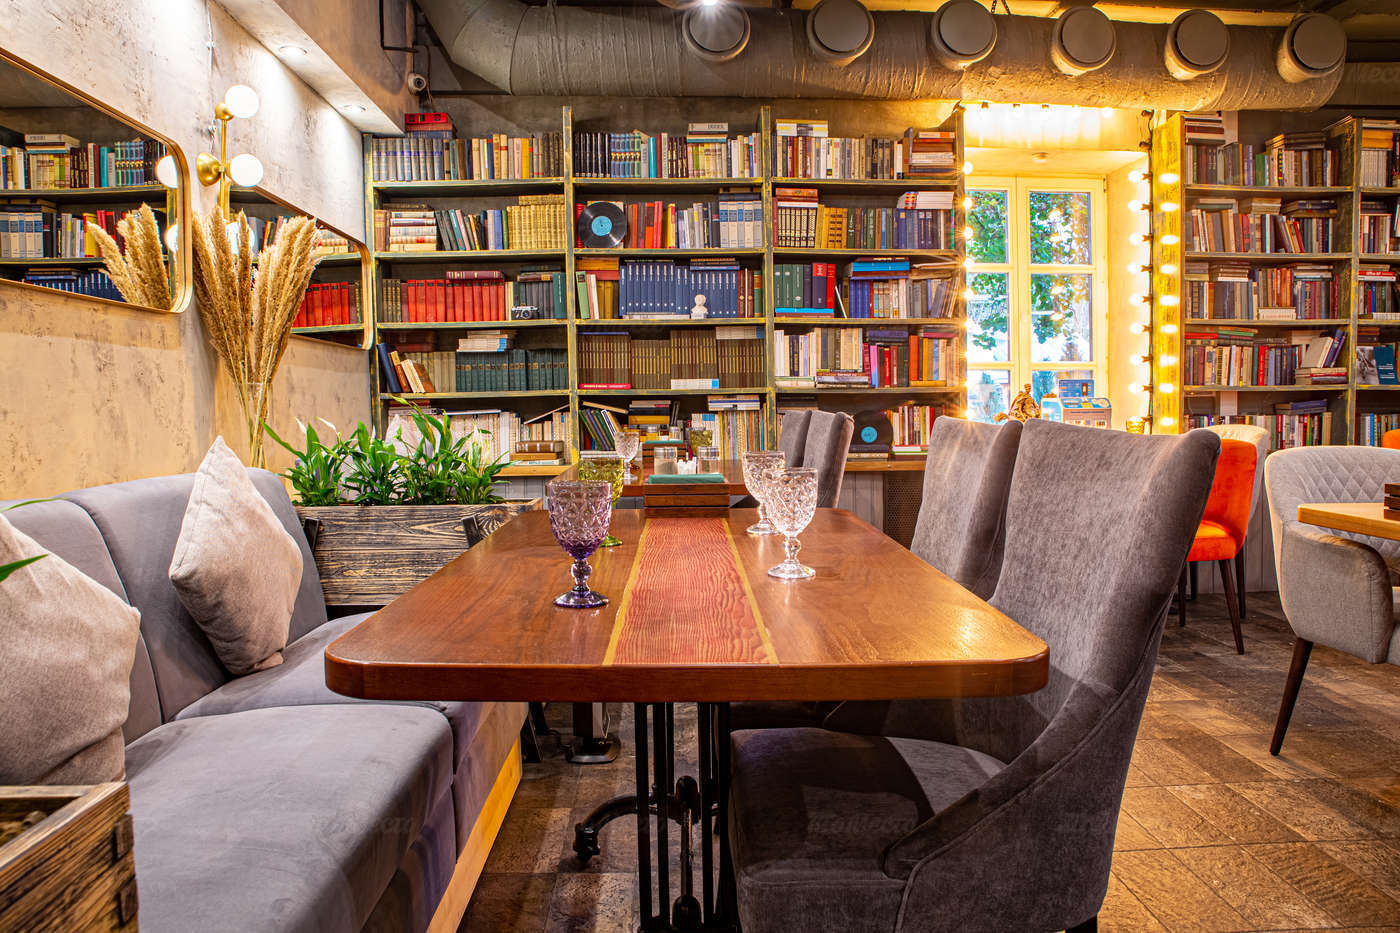 Ресторан IL LETTERATO (Литератор) в Петроверигском переулке фото 8